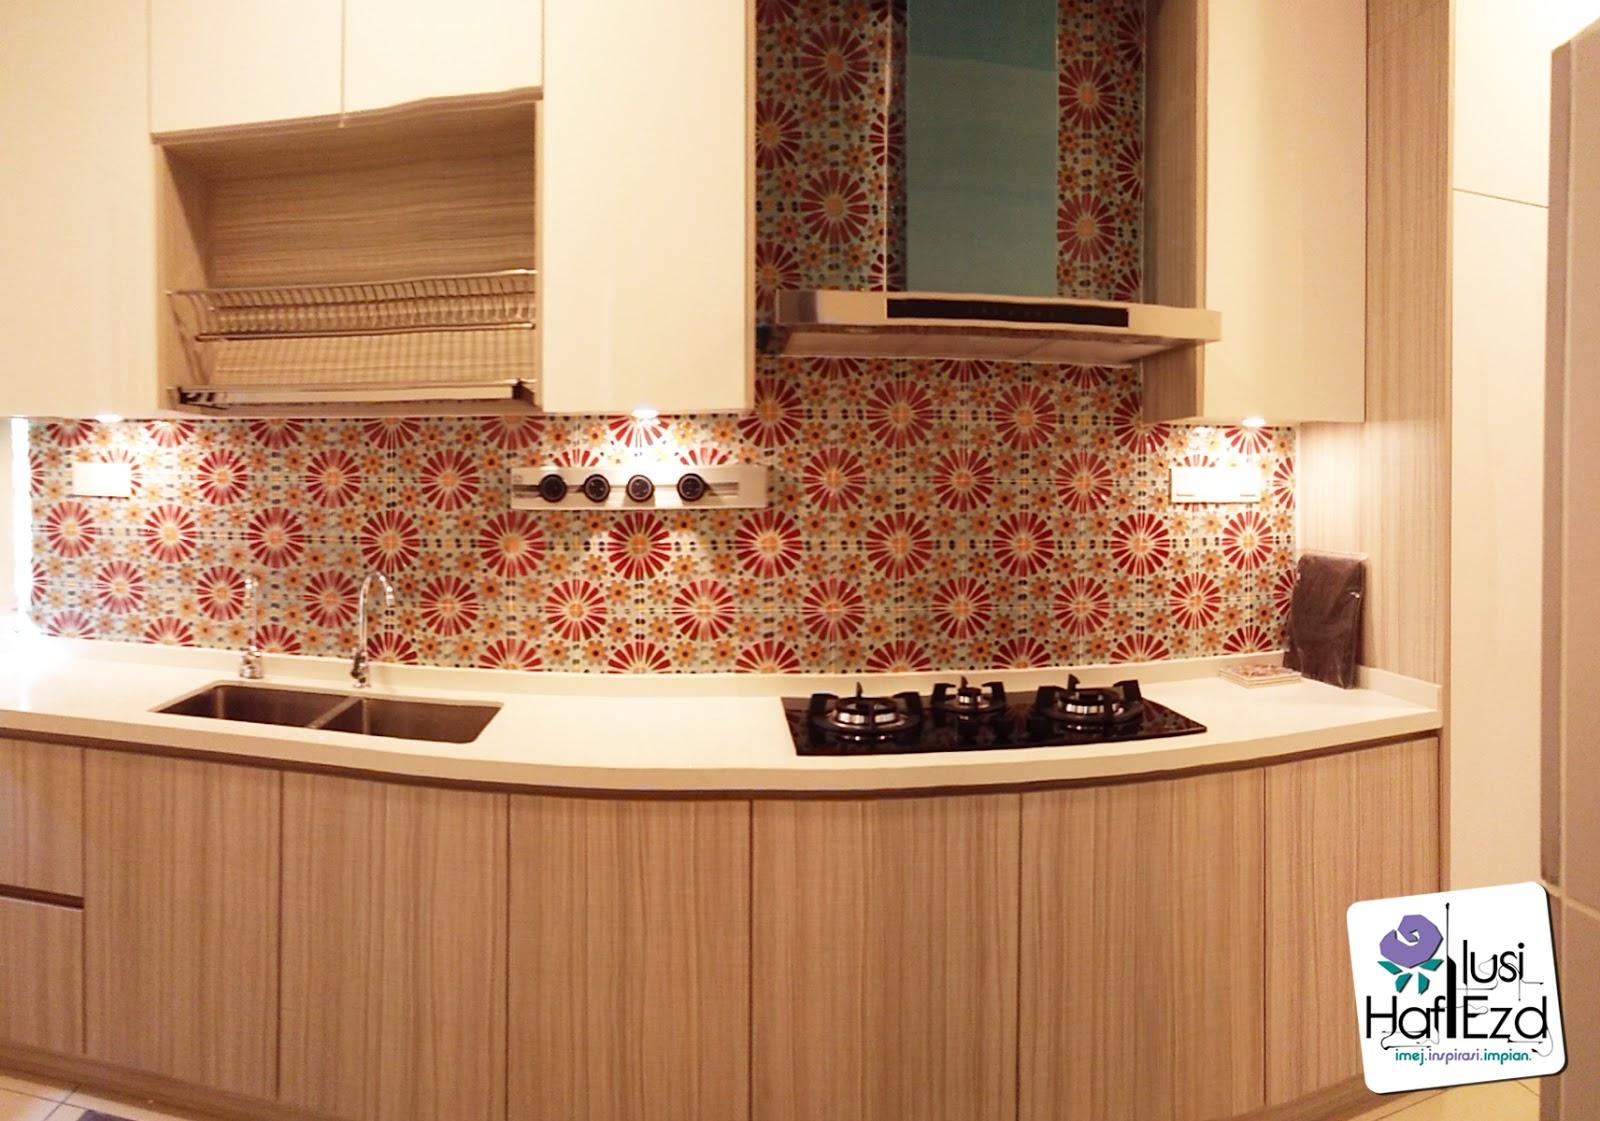 Kali Ini Saya Akan Kongsikan Rekaan Kabinet Dapur Di Rumah Pelanggan Ilusi Hafiezd Design Alam Impian